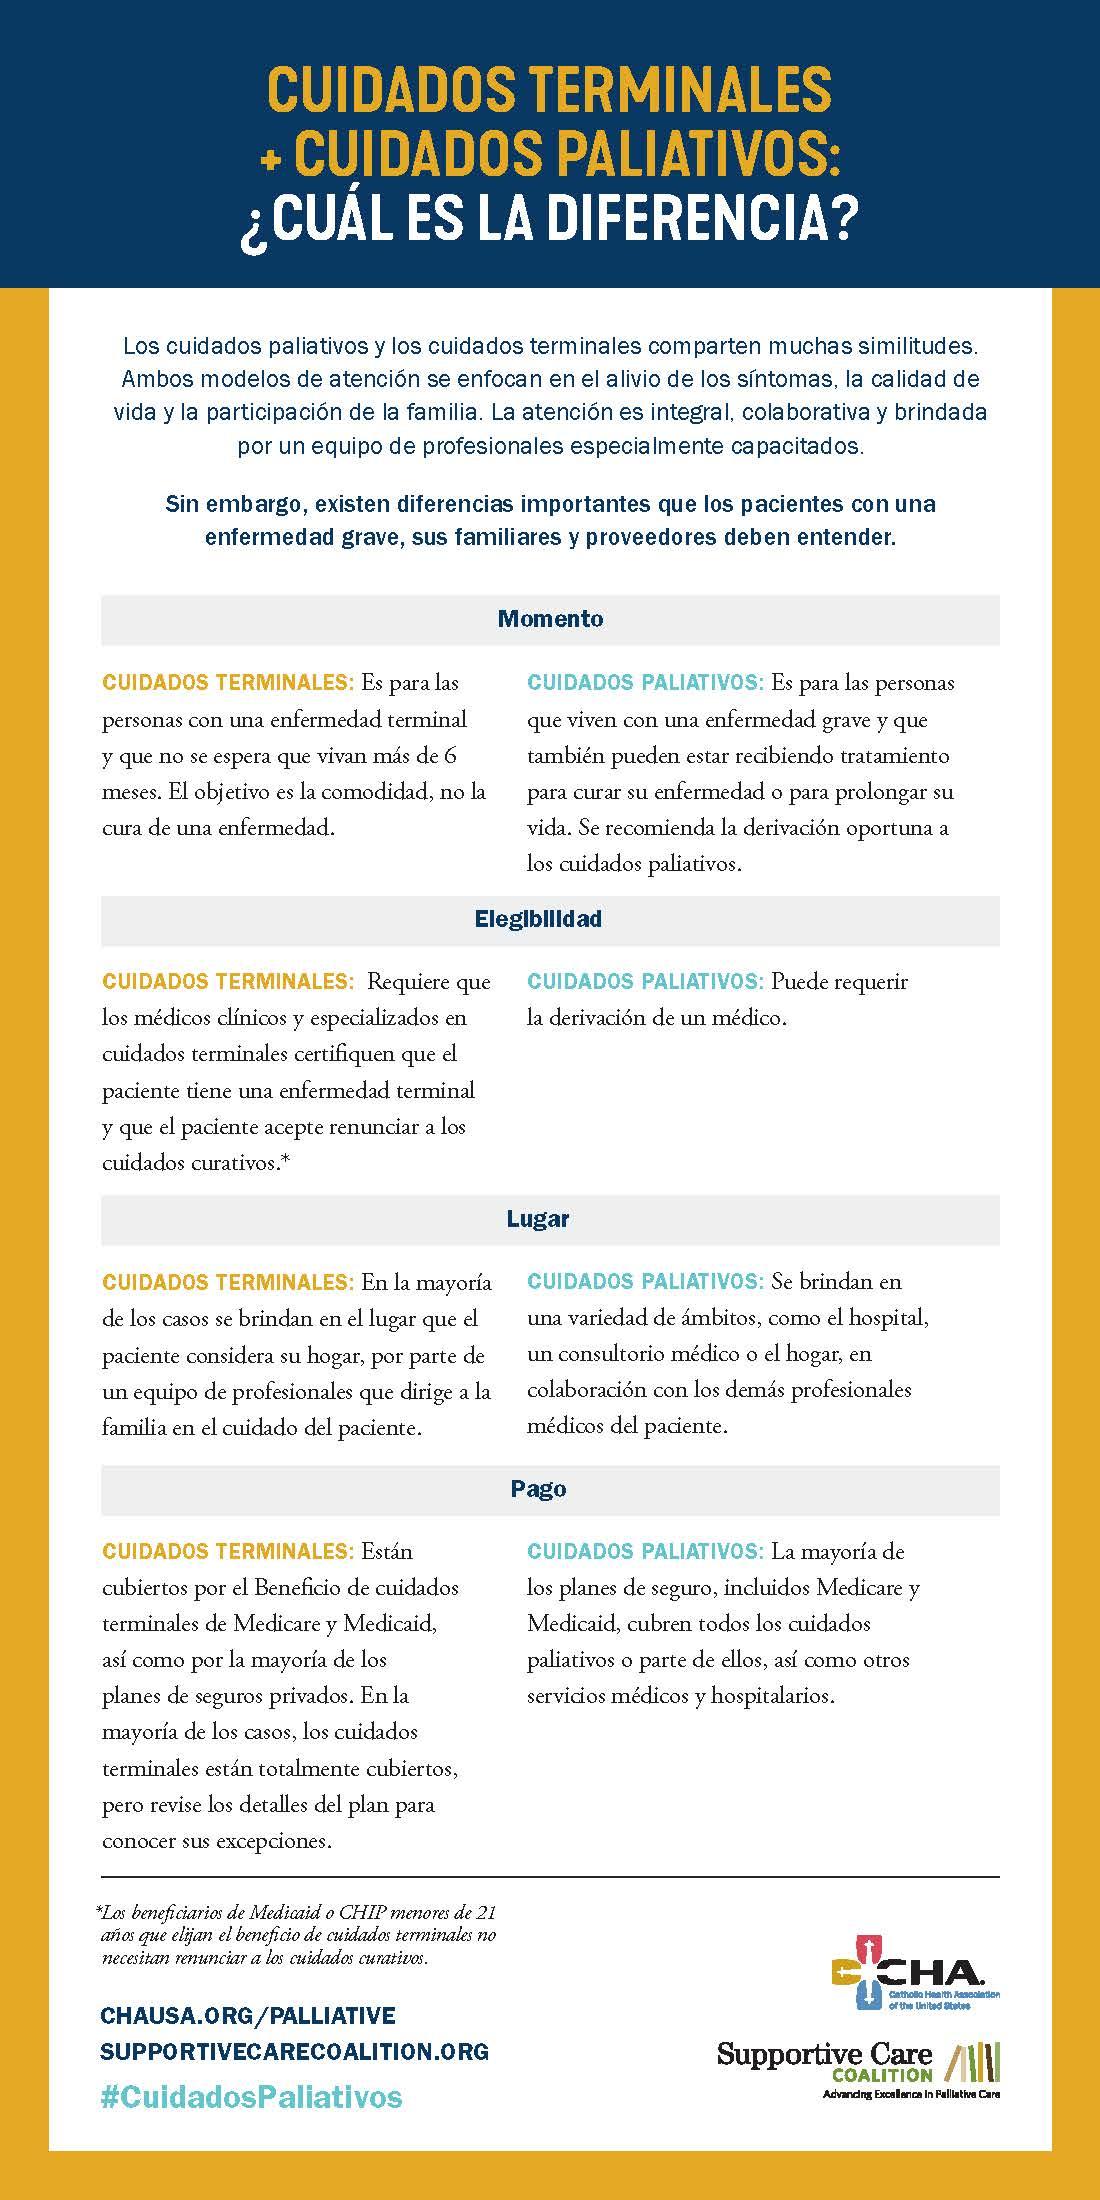 CHA_H+PC_InfoCard_Difference_SPANISH.jpg